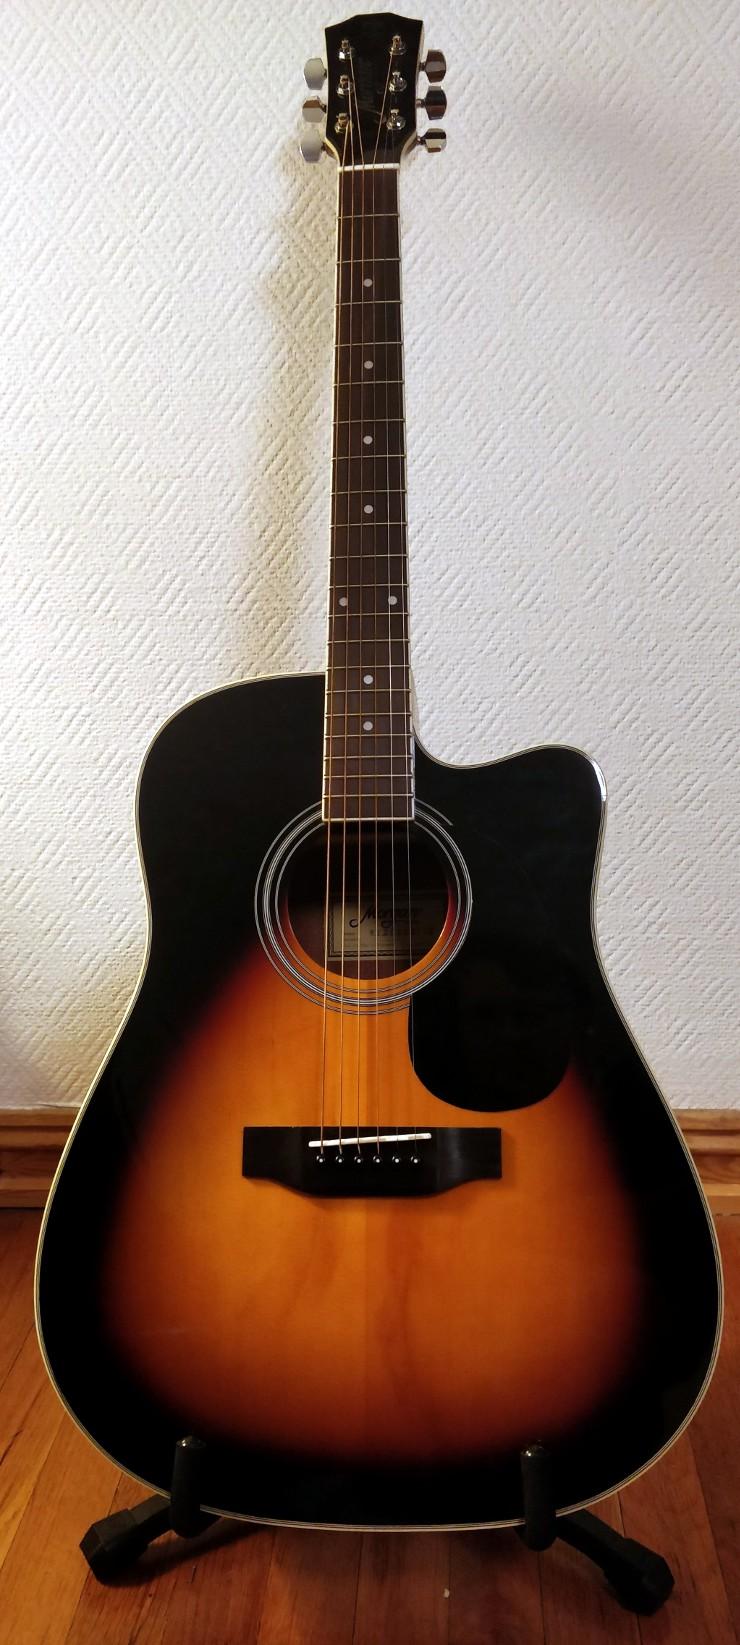 Shiny acoustic guitar, yay